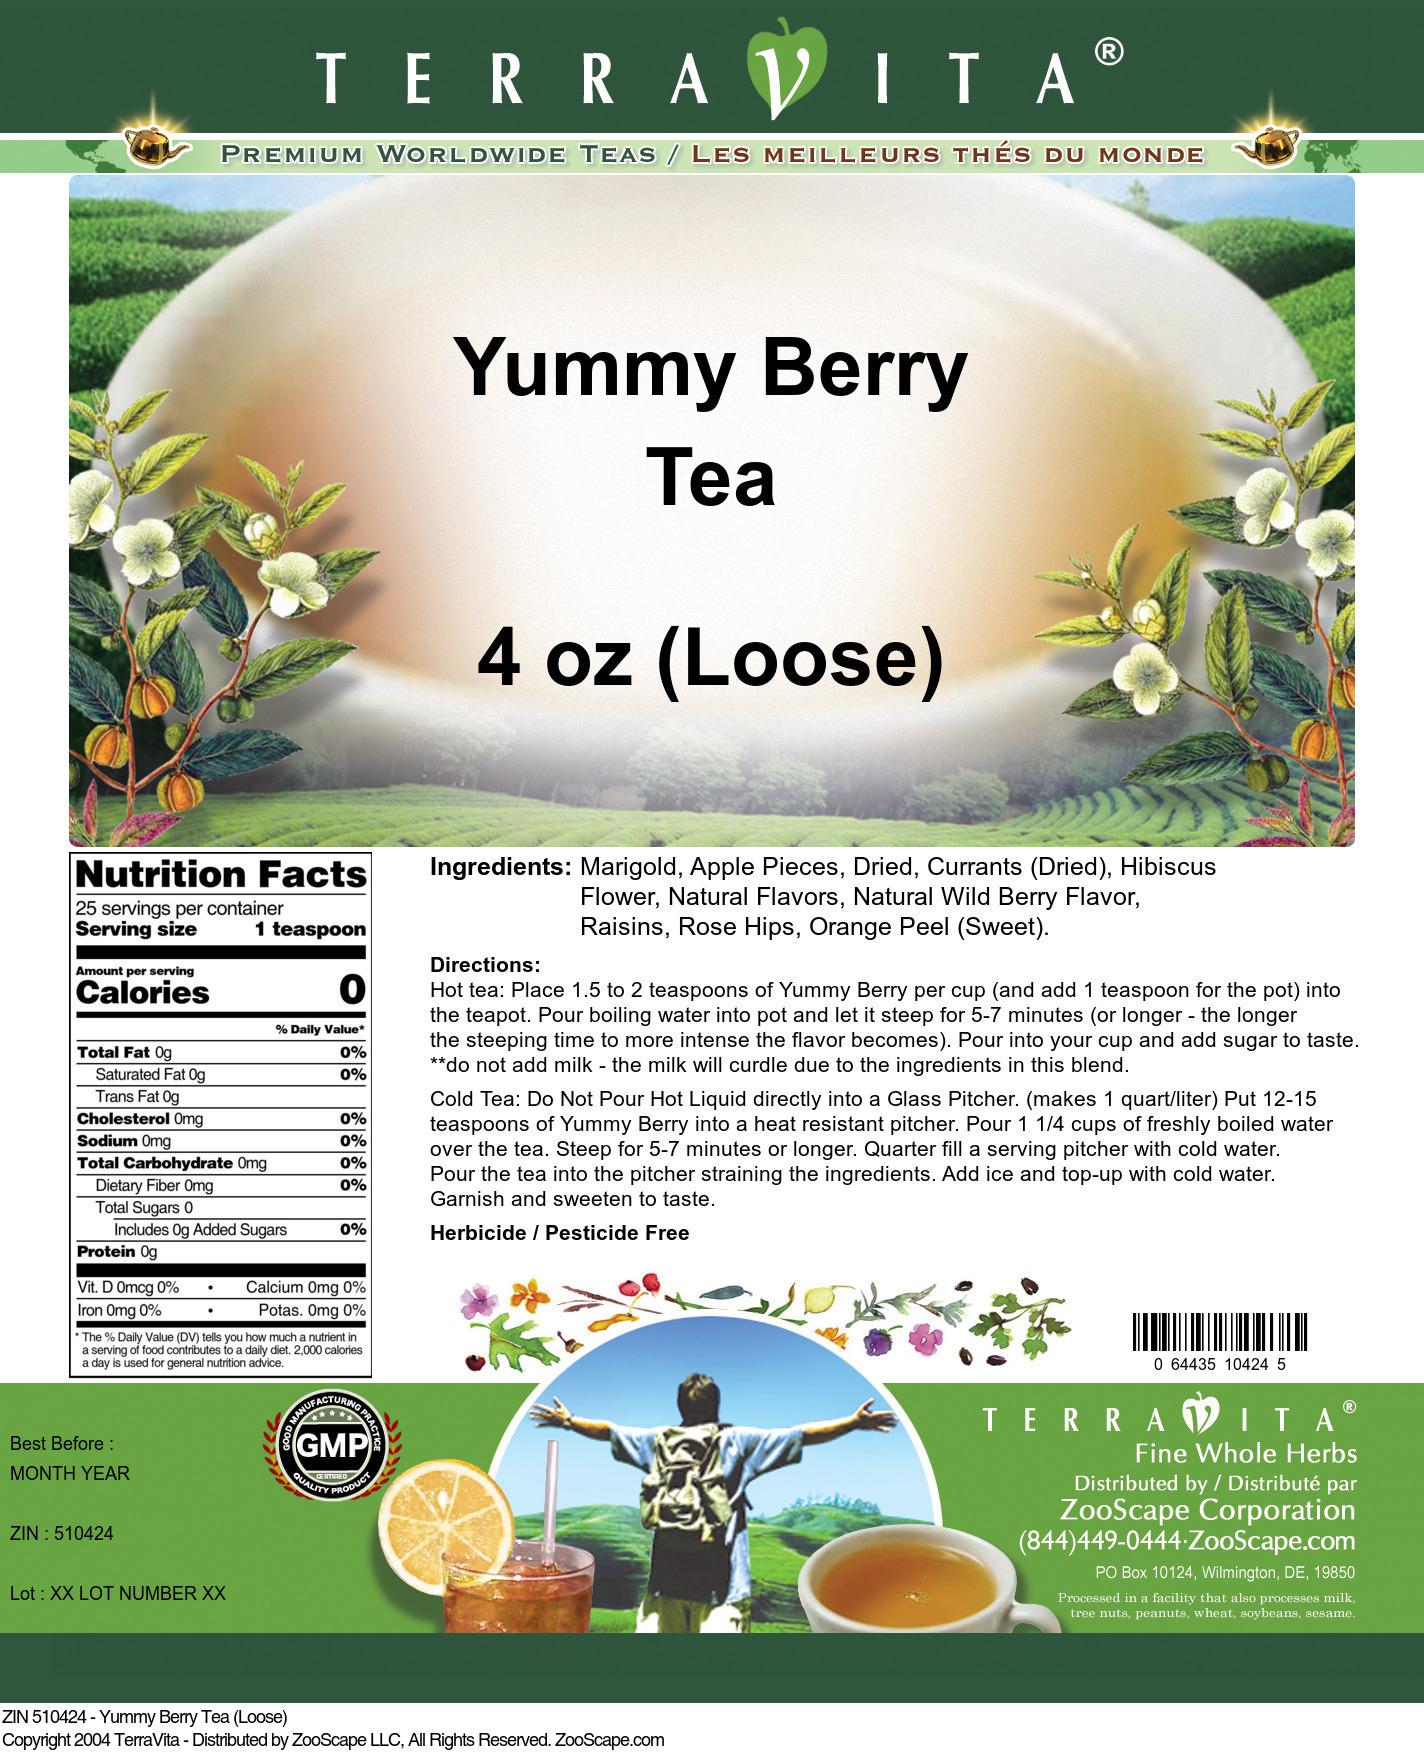 Yummy Berry